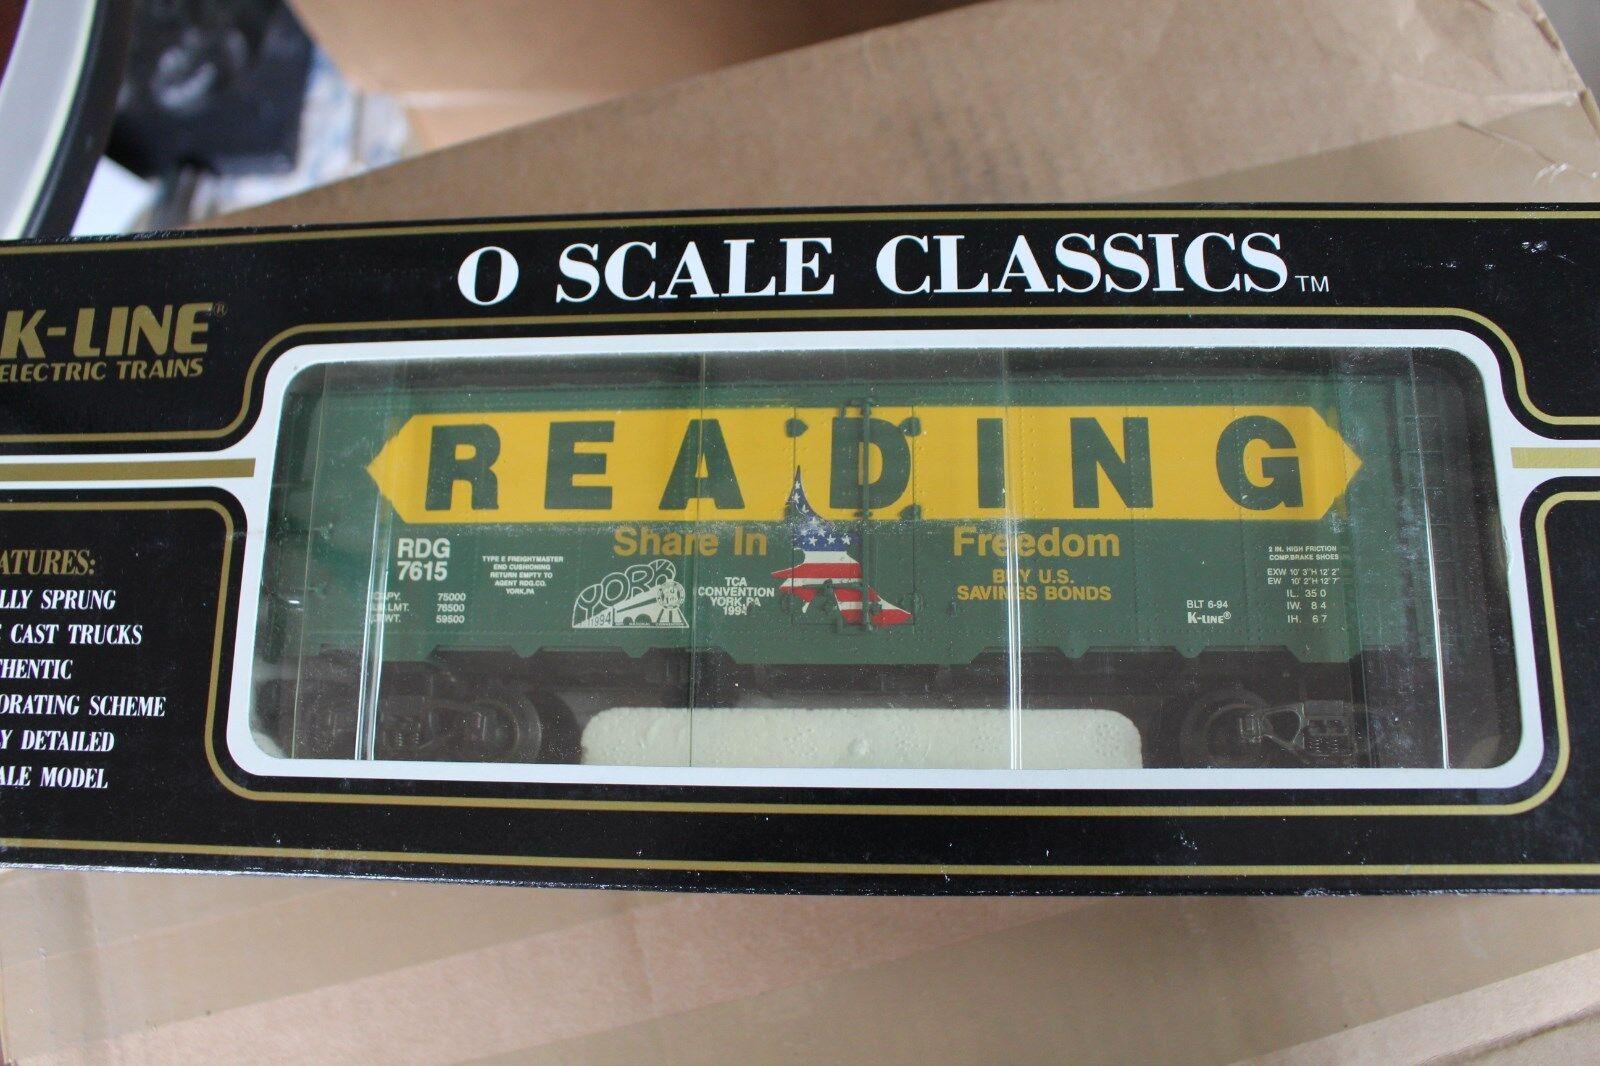 1994 K-Line K7615 Reading Classic Box Car TCA Convention Car L2772